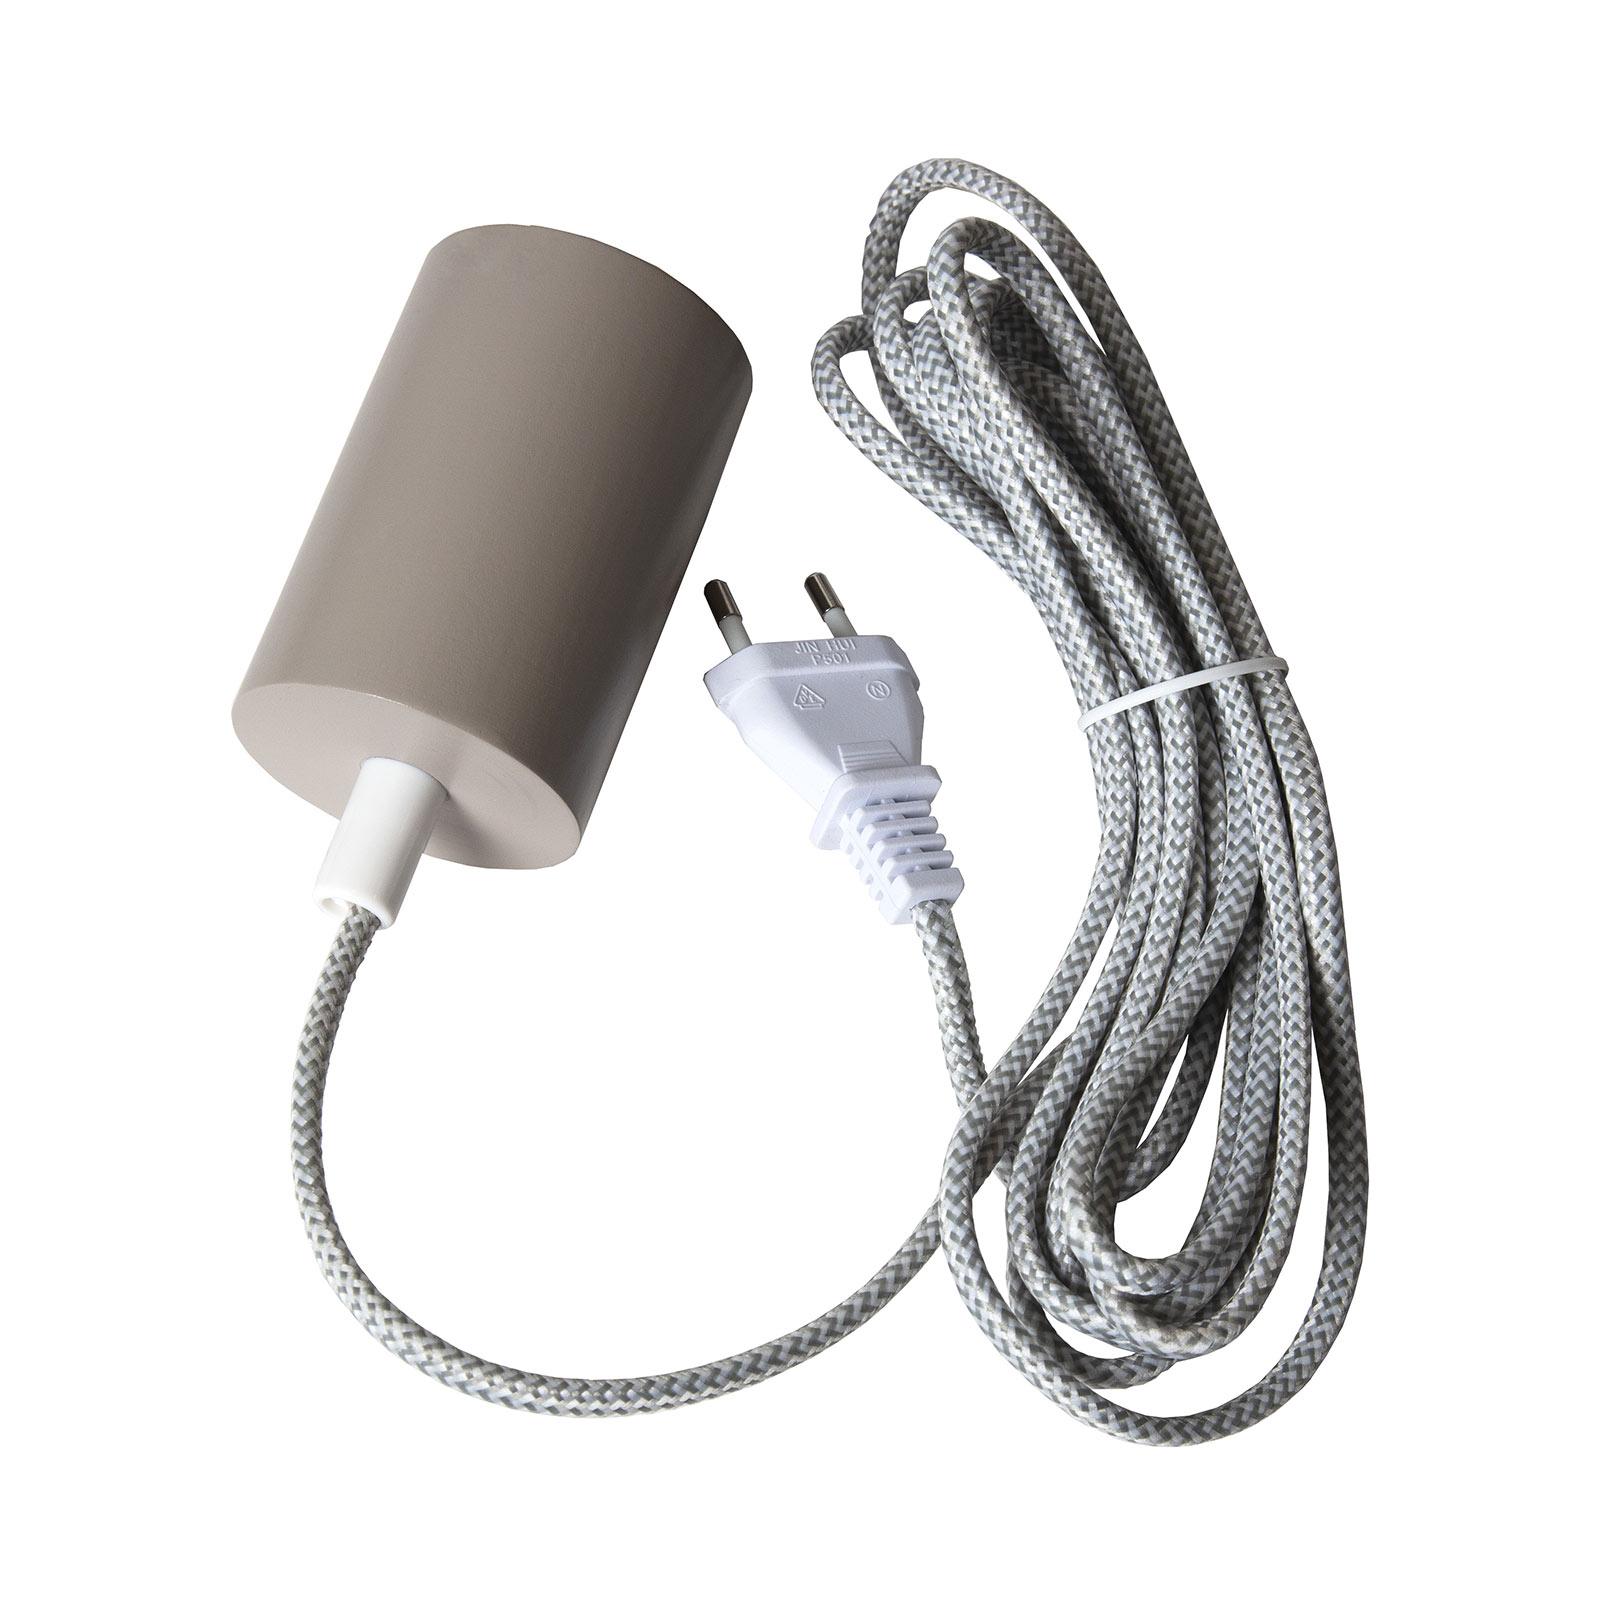 E27-fitting Slim met kabel, grijs